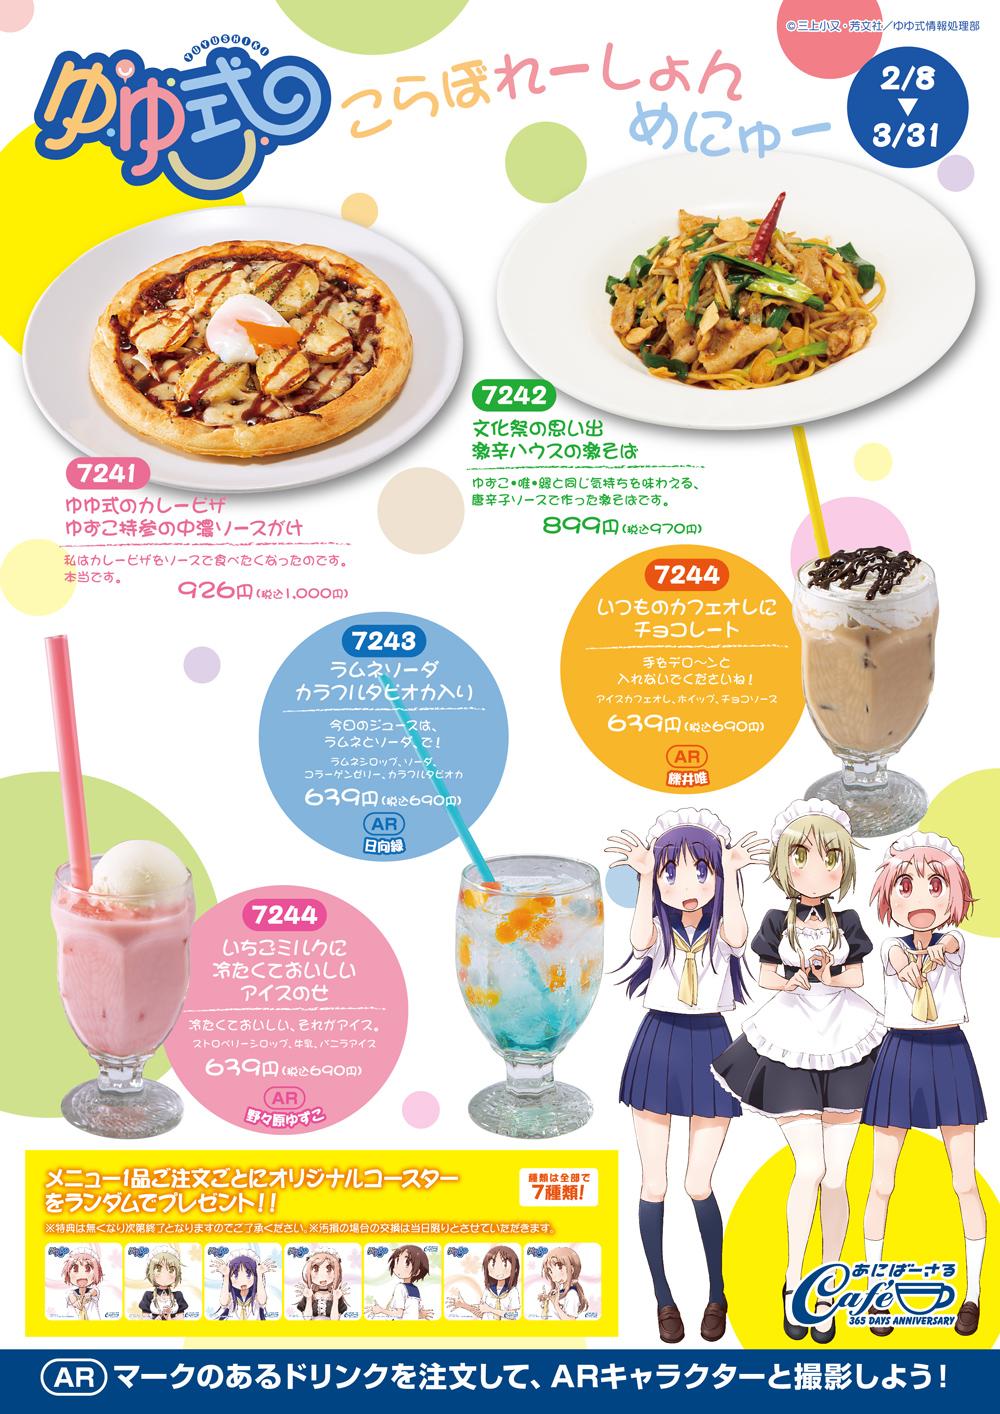 img_menu_yuyu.png